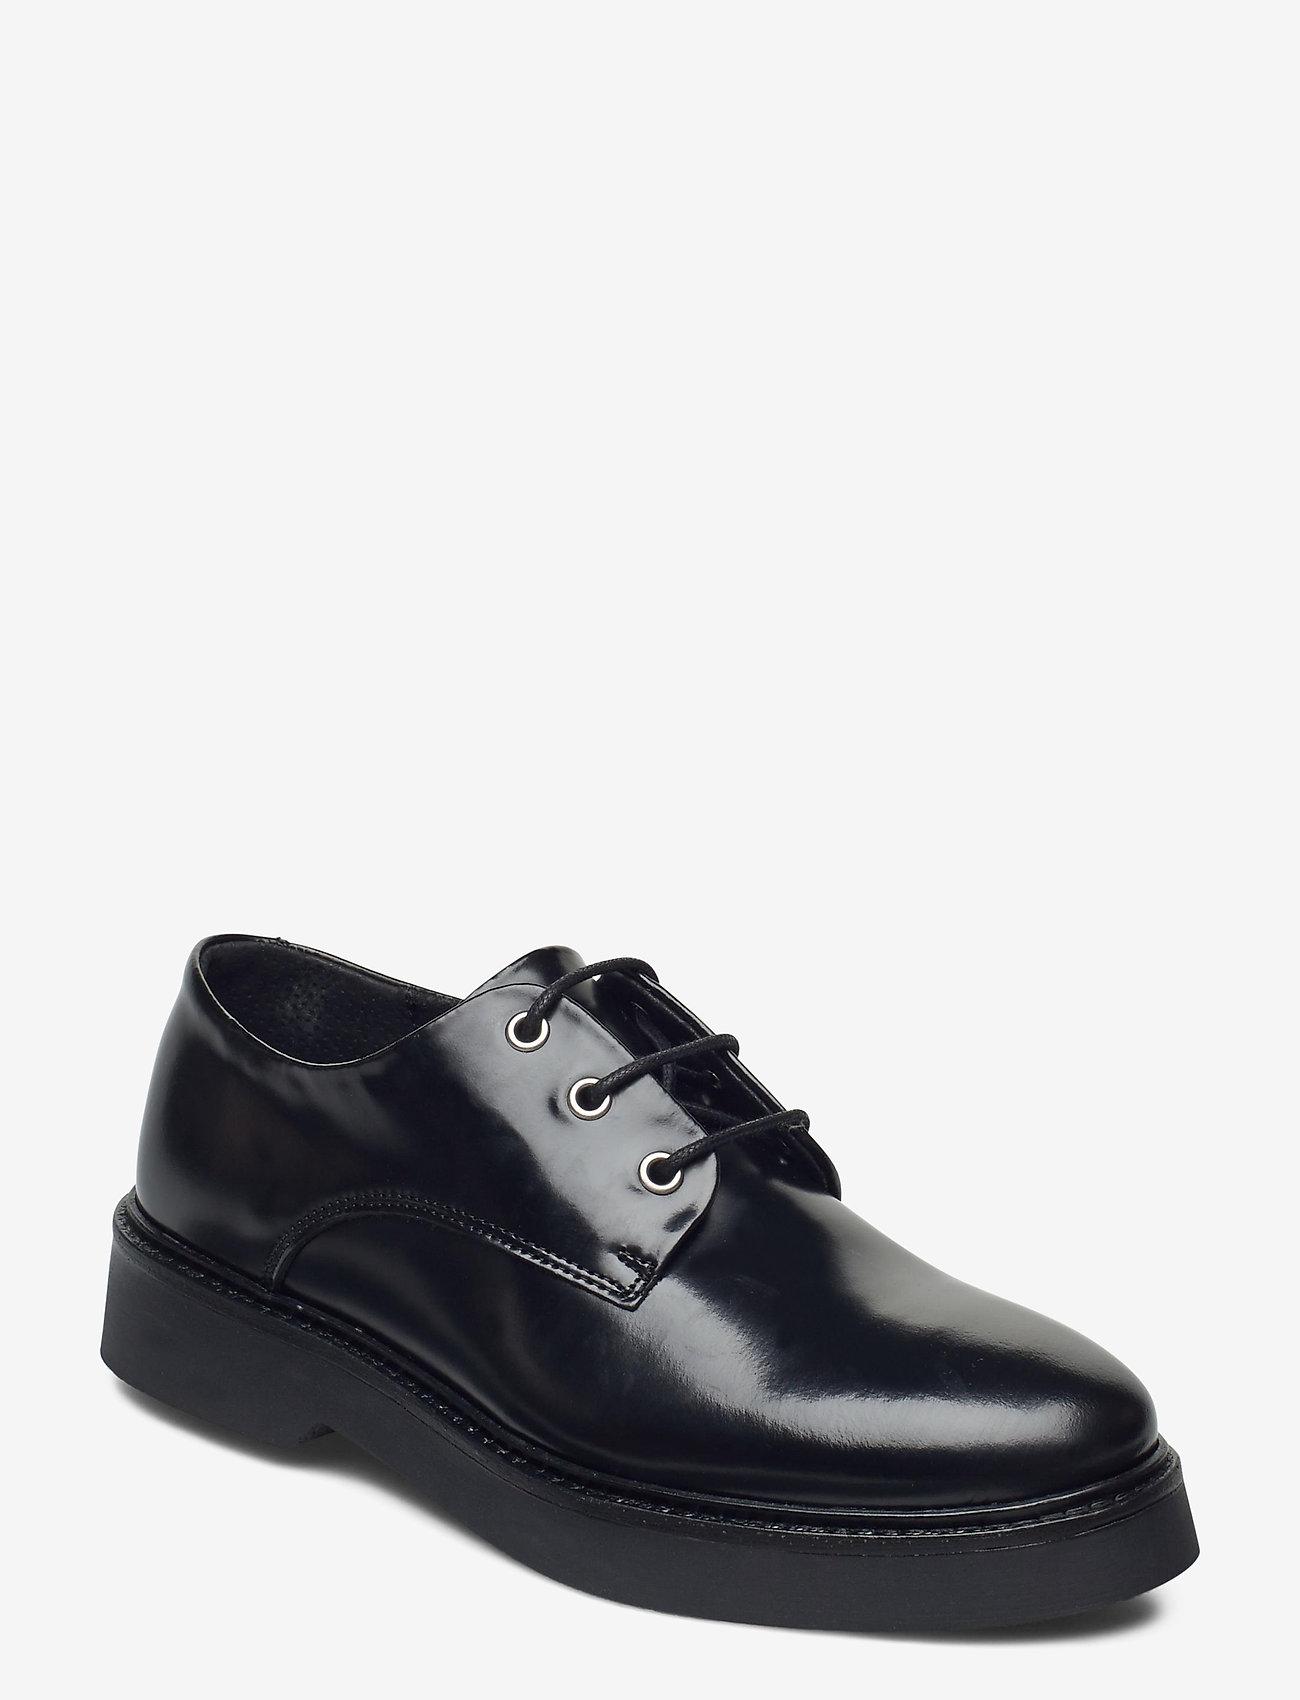 Shoe The Bear - BILLIE L - schnürschuhe - black - 0